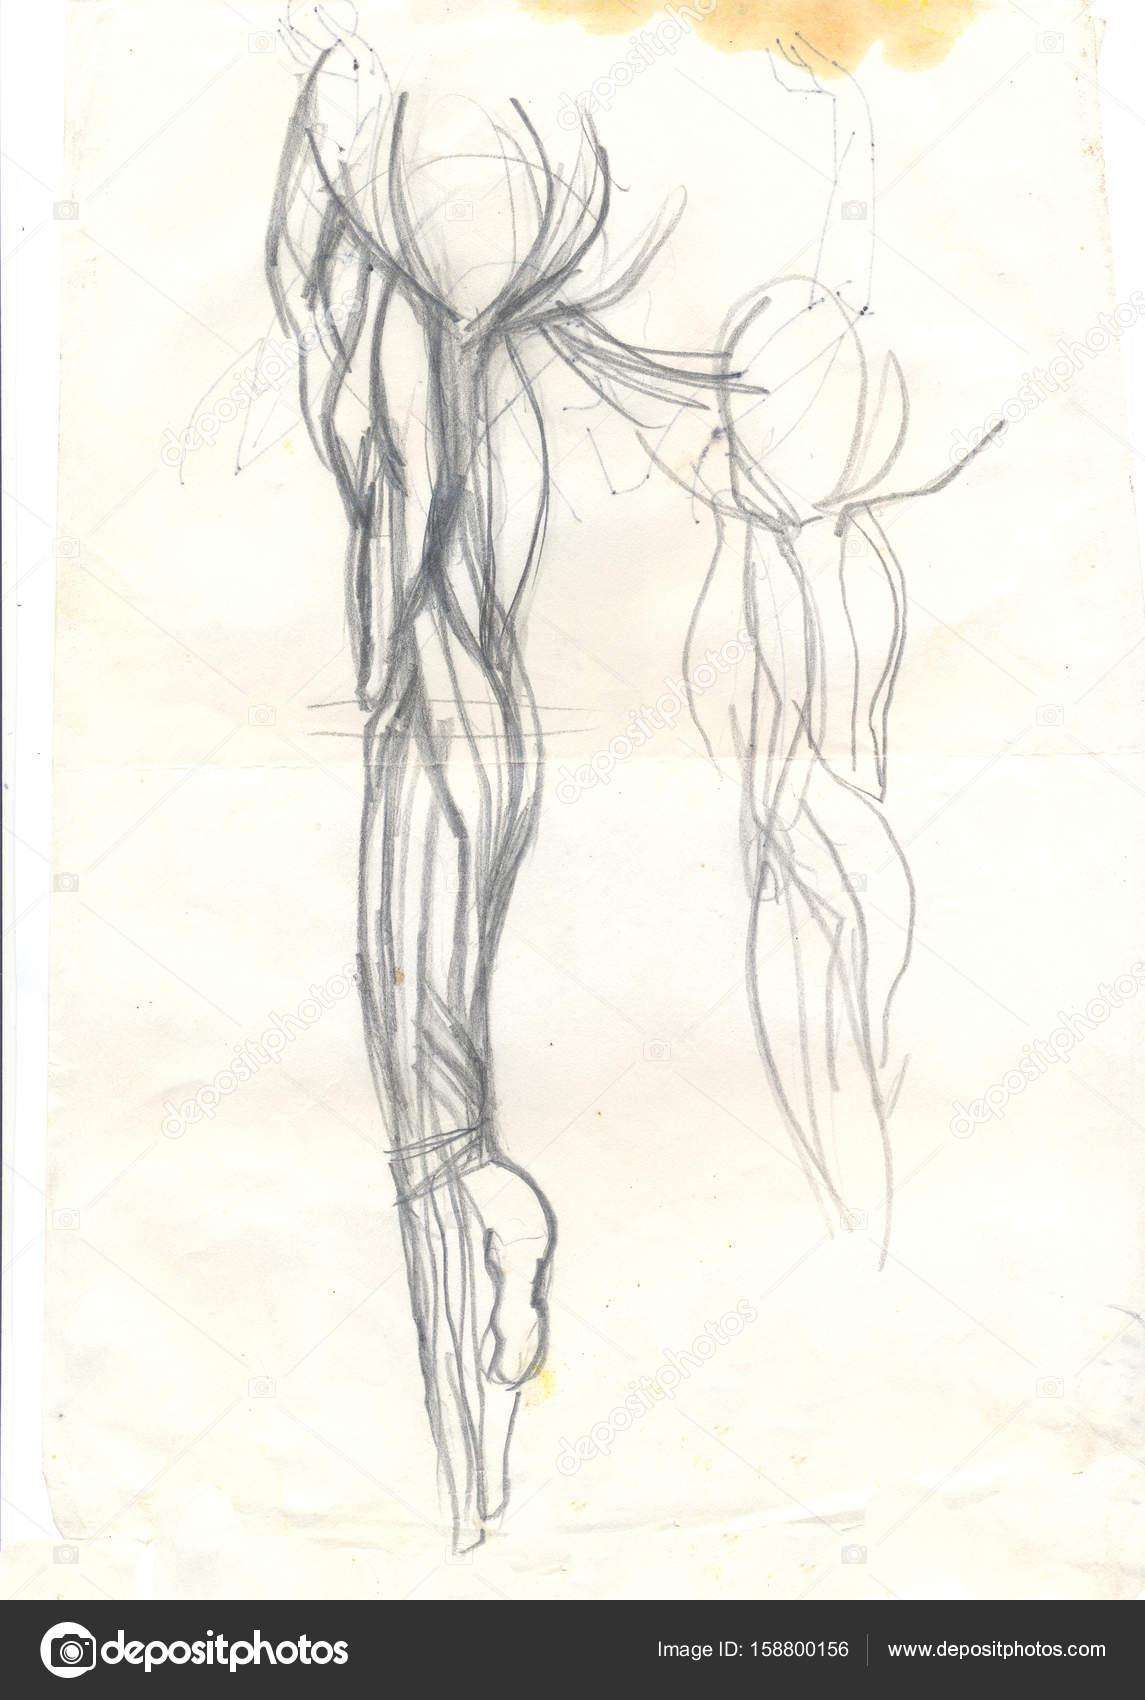 músculos de brazo lateral — Foto de stock © richcat #158800156